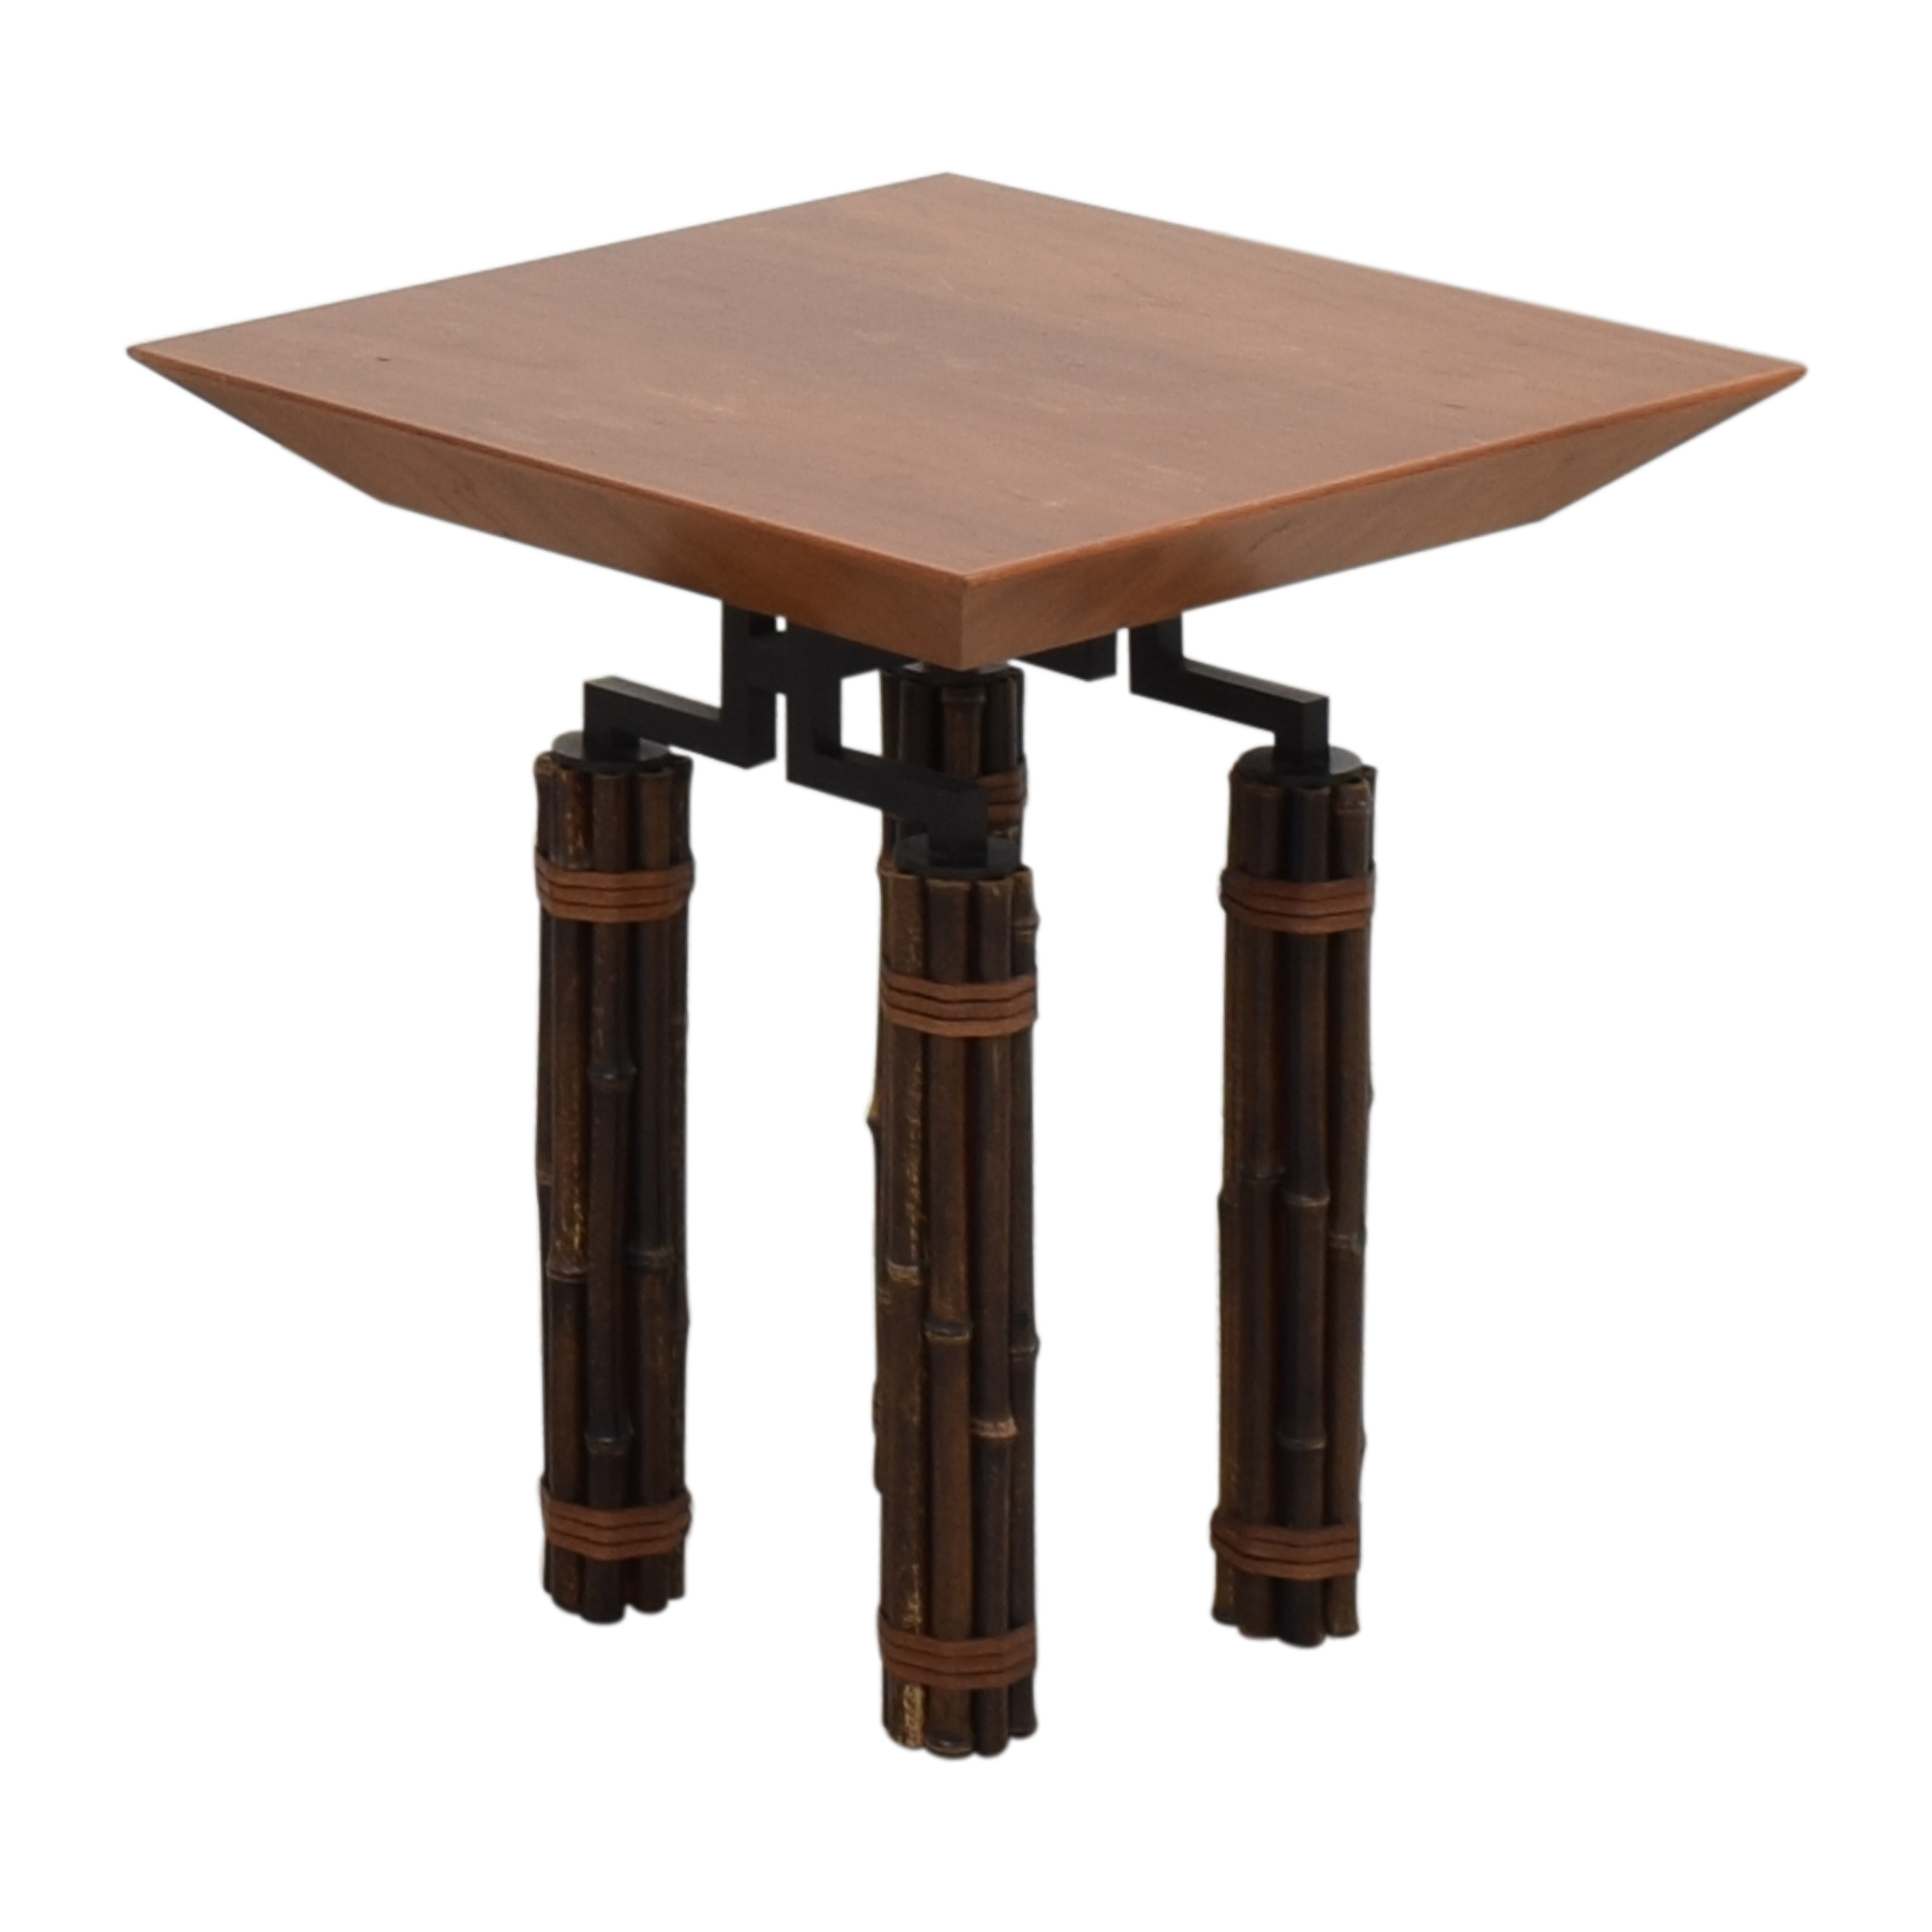 McGuire McGuire Huxley Martini Side Table on sale